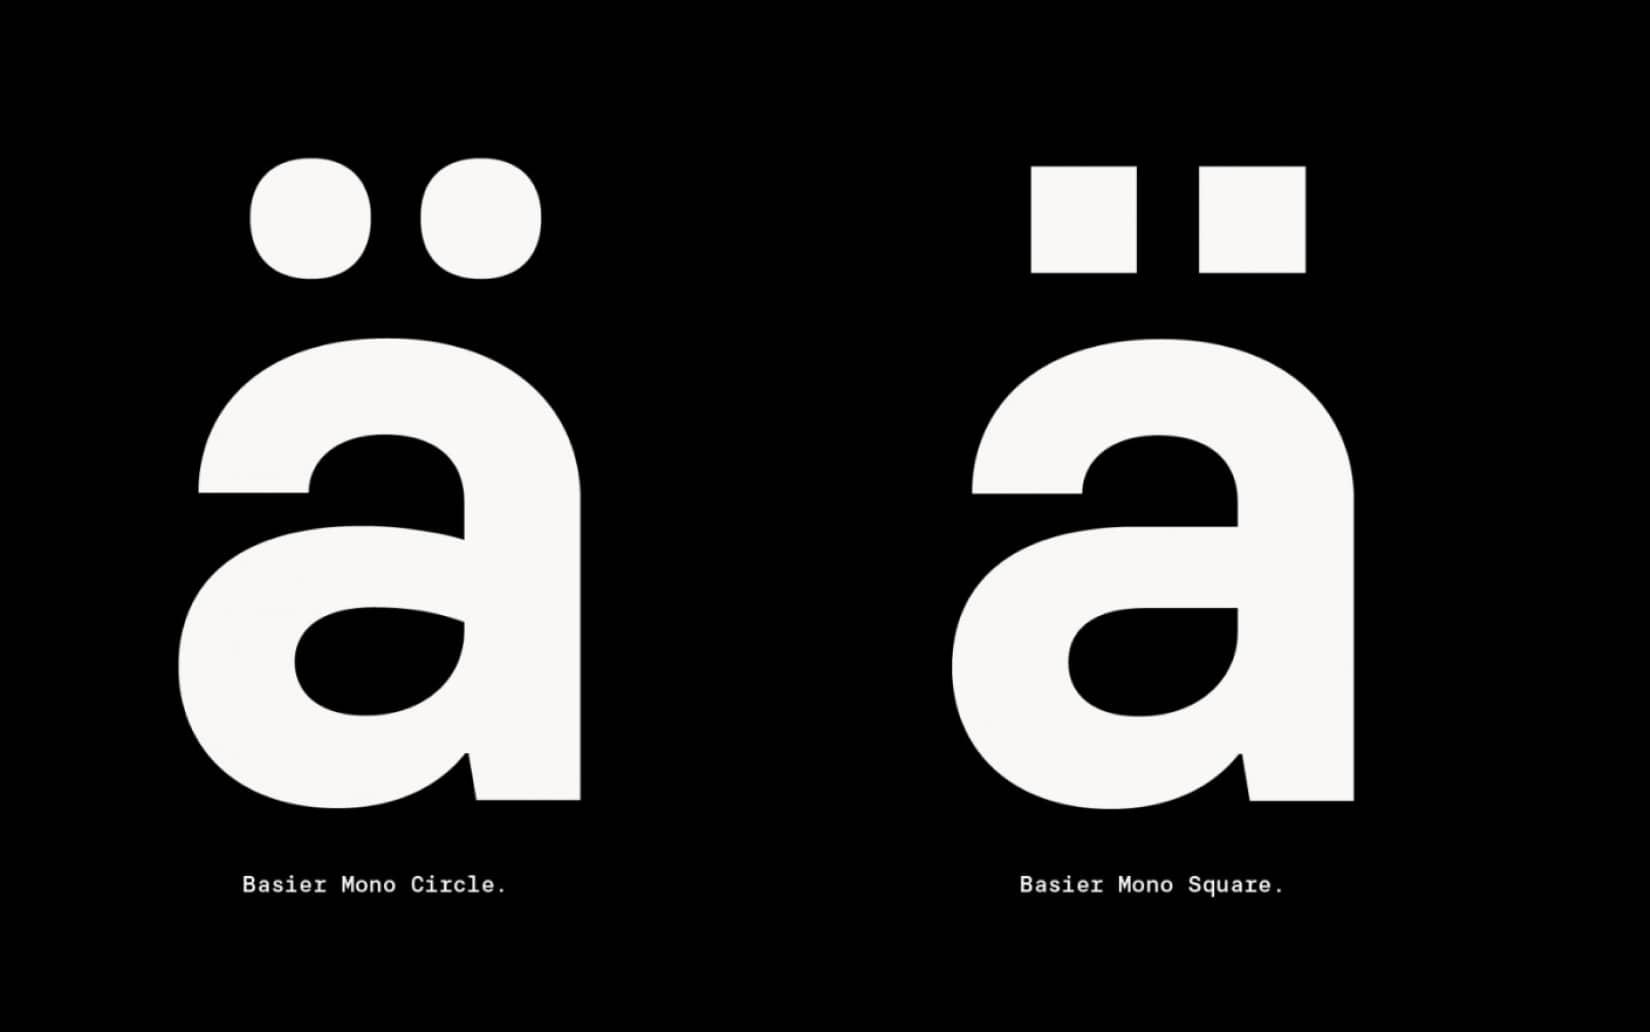 Best Free Sans Serif Fonts Basier Mono